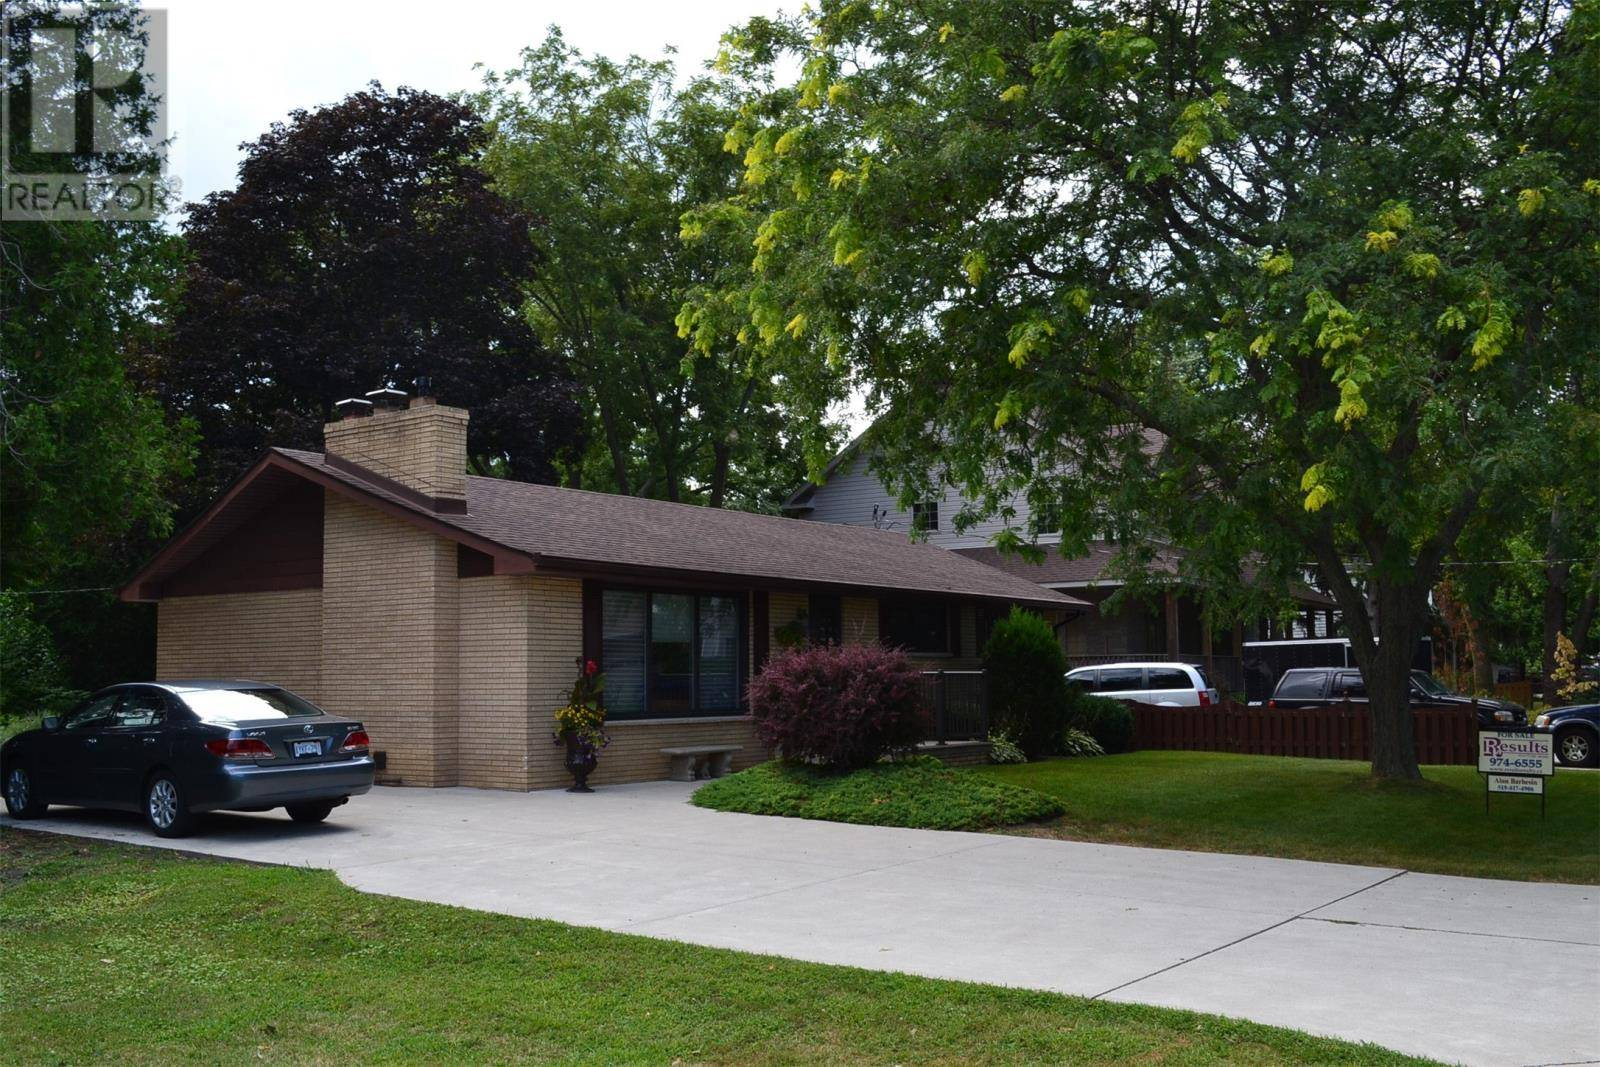 House for sale at 285 Burdick Cres Tecumseh Ontario - MLS: 19023896